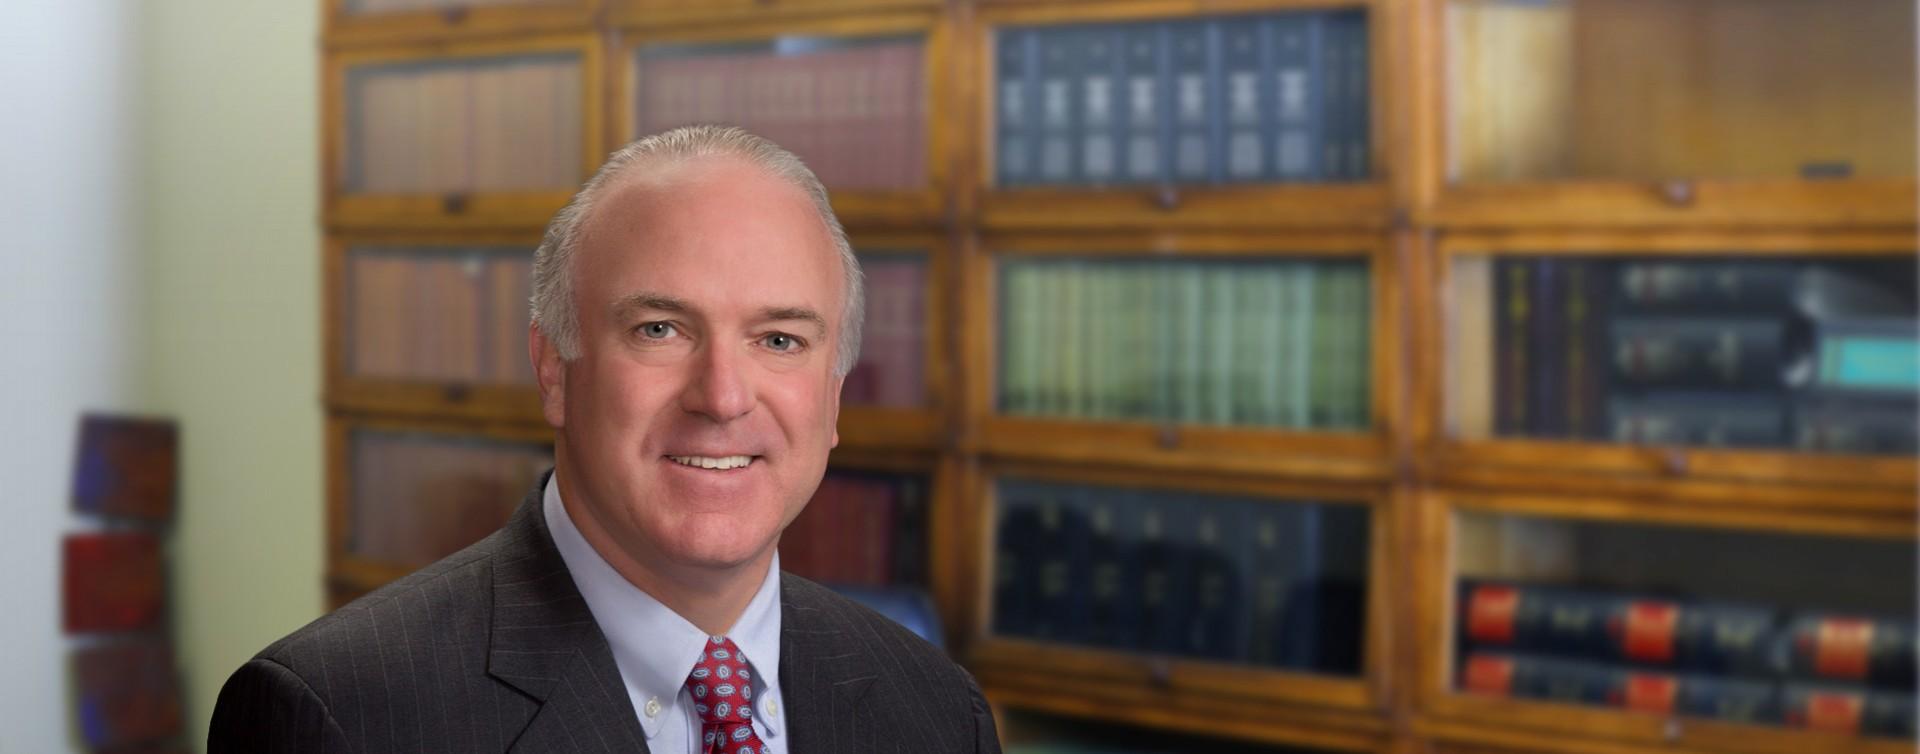 Bernard Kennedy business lawyer, Bond, Schoeneck & King, Long Island ...